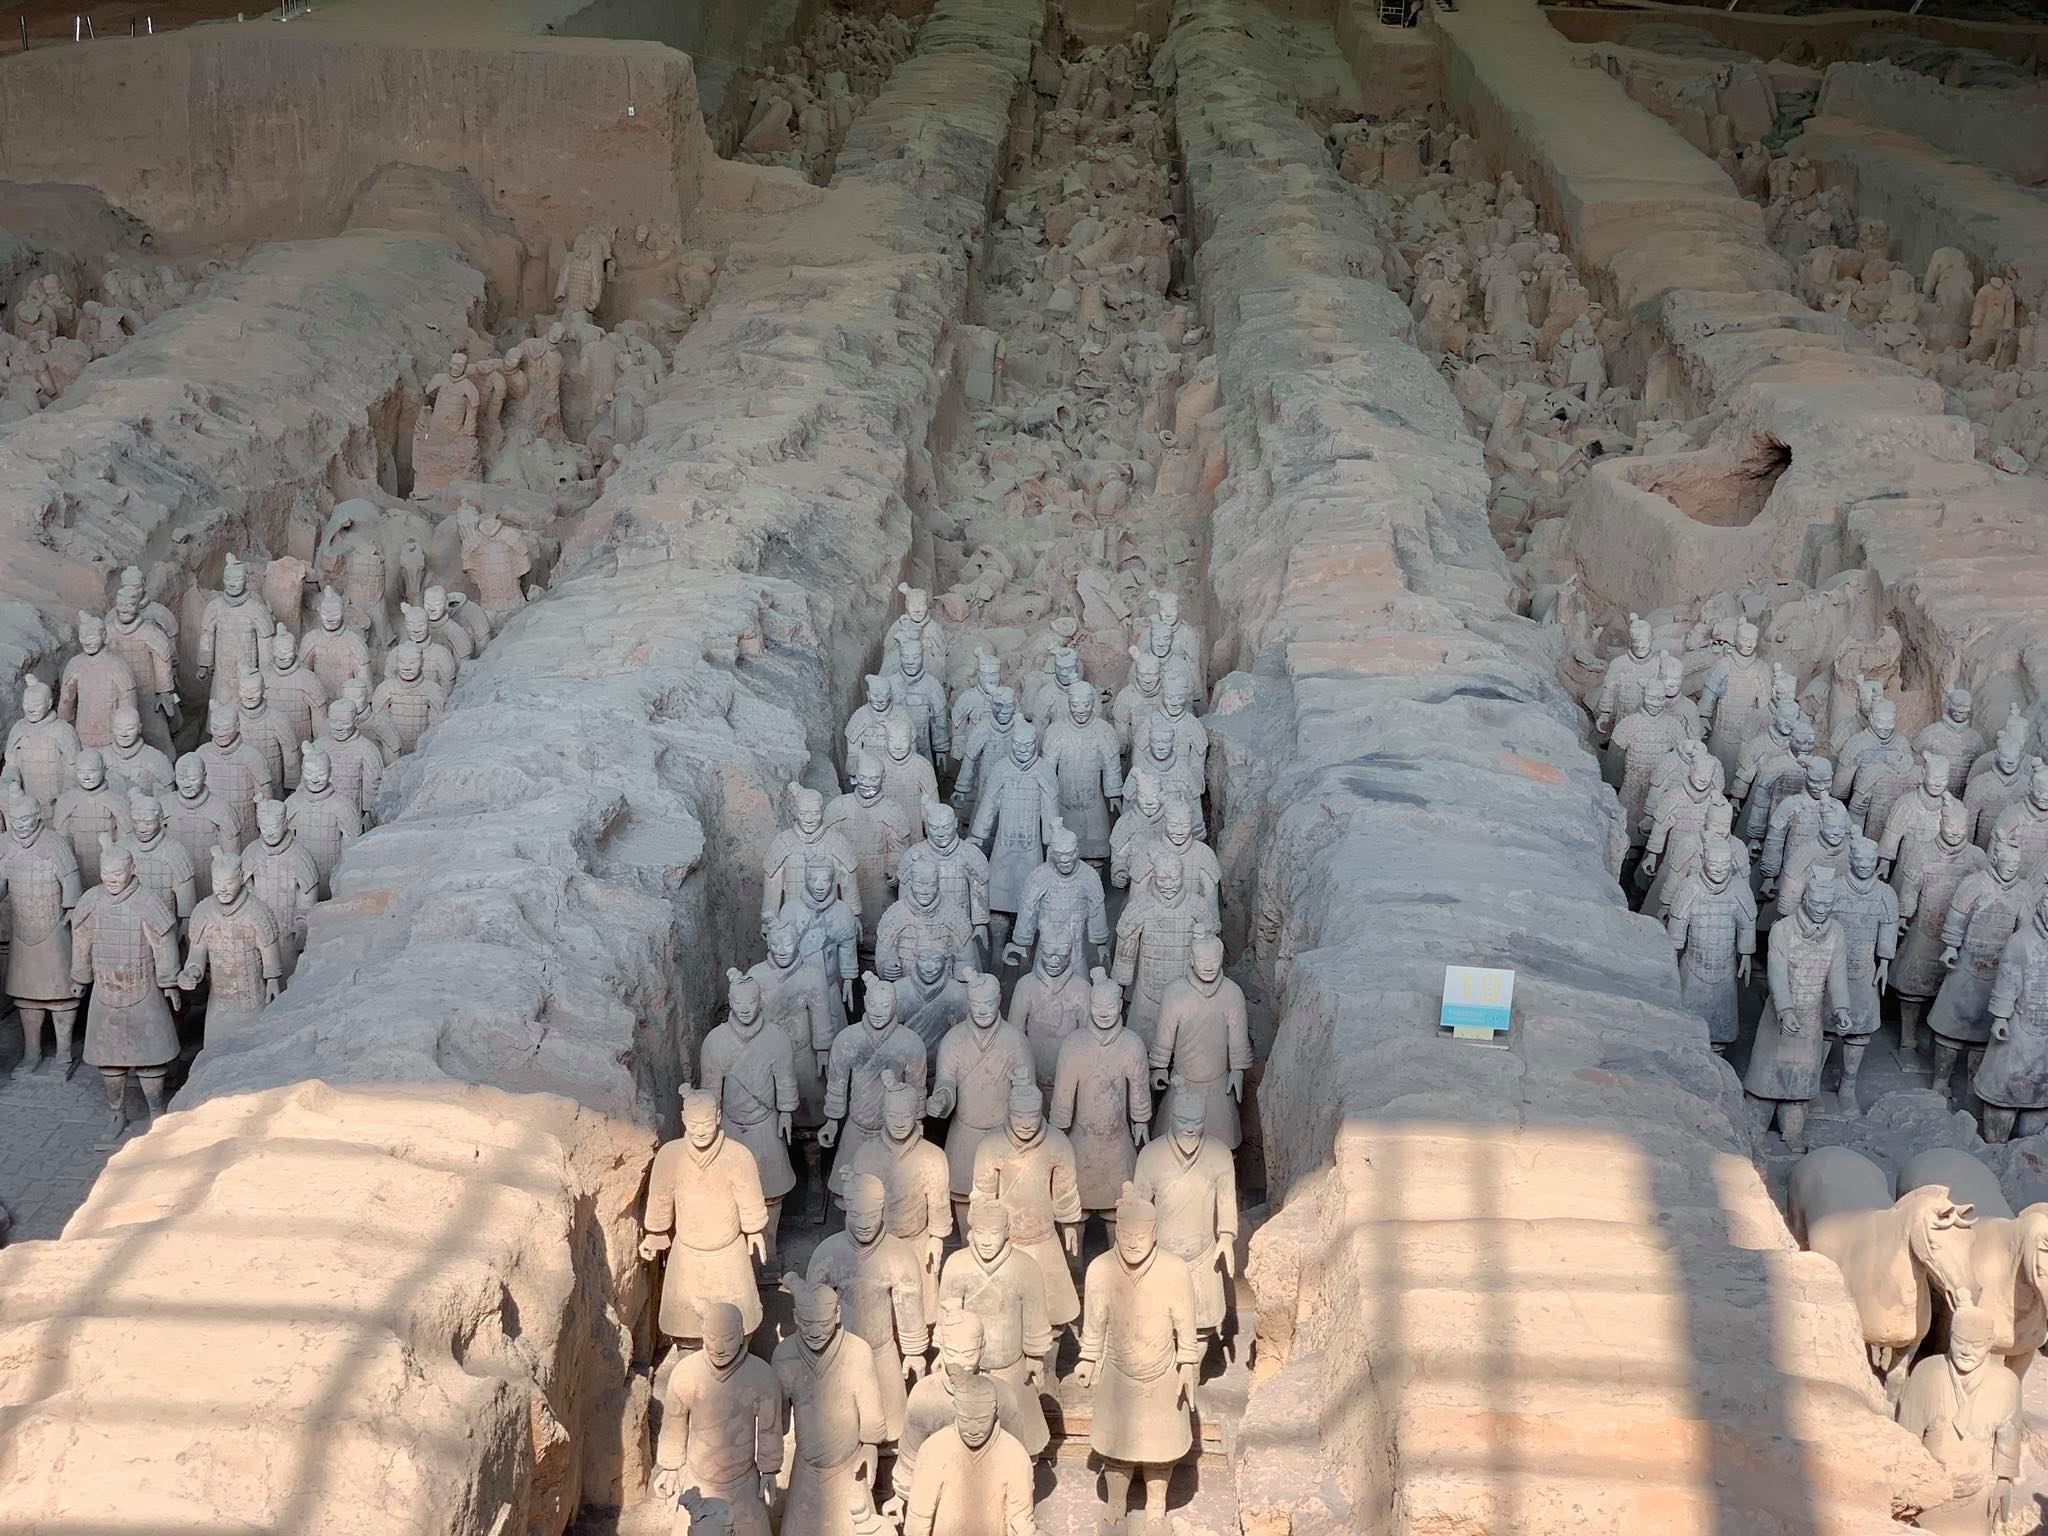 Day 4: Terracotta Warriors & Xi'an / China